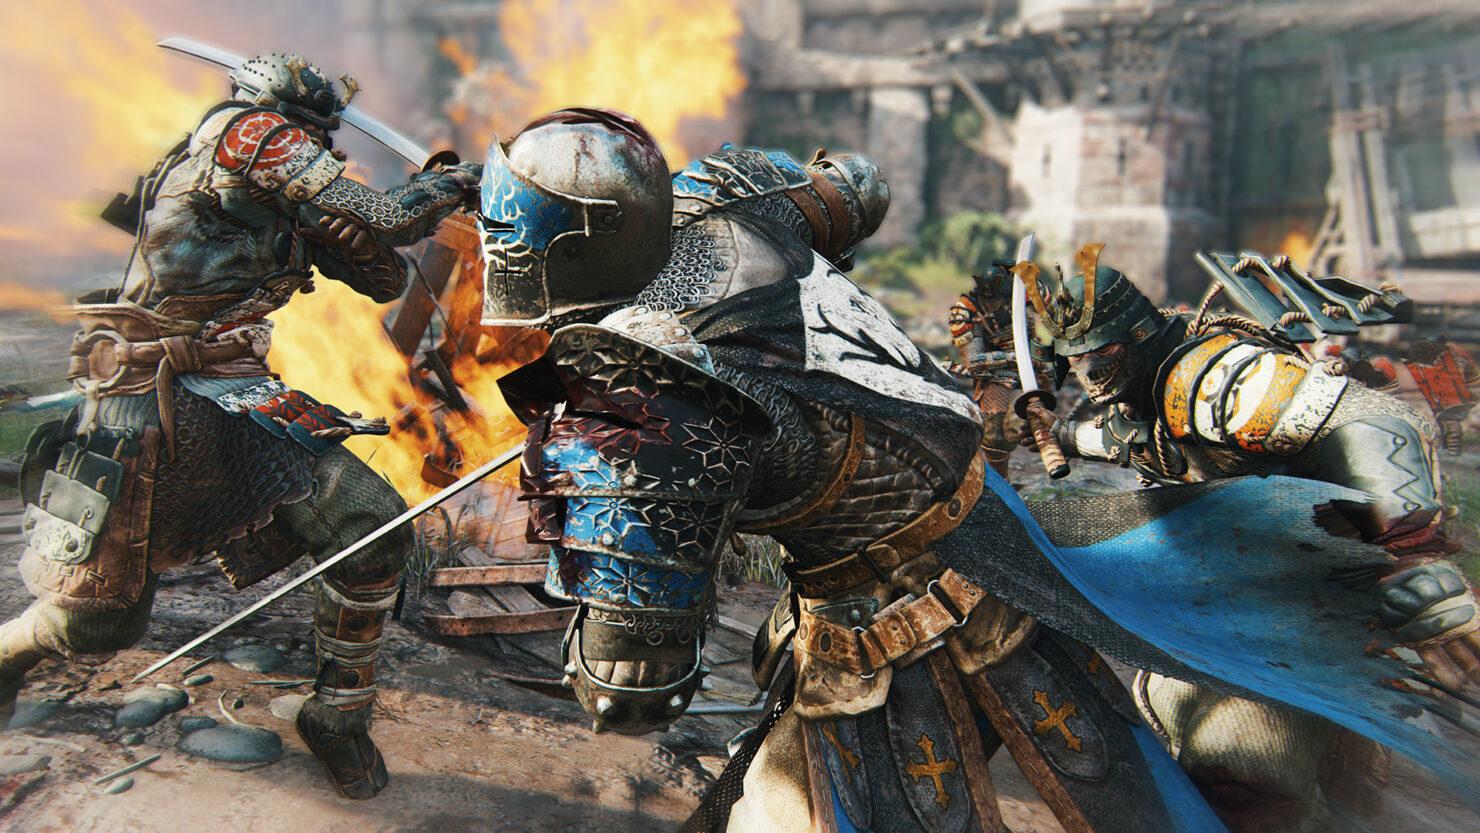 for_honor_screen_harrowgate_samuraisattackwarden